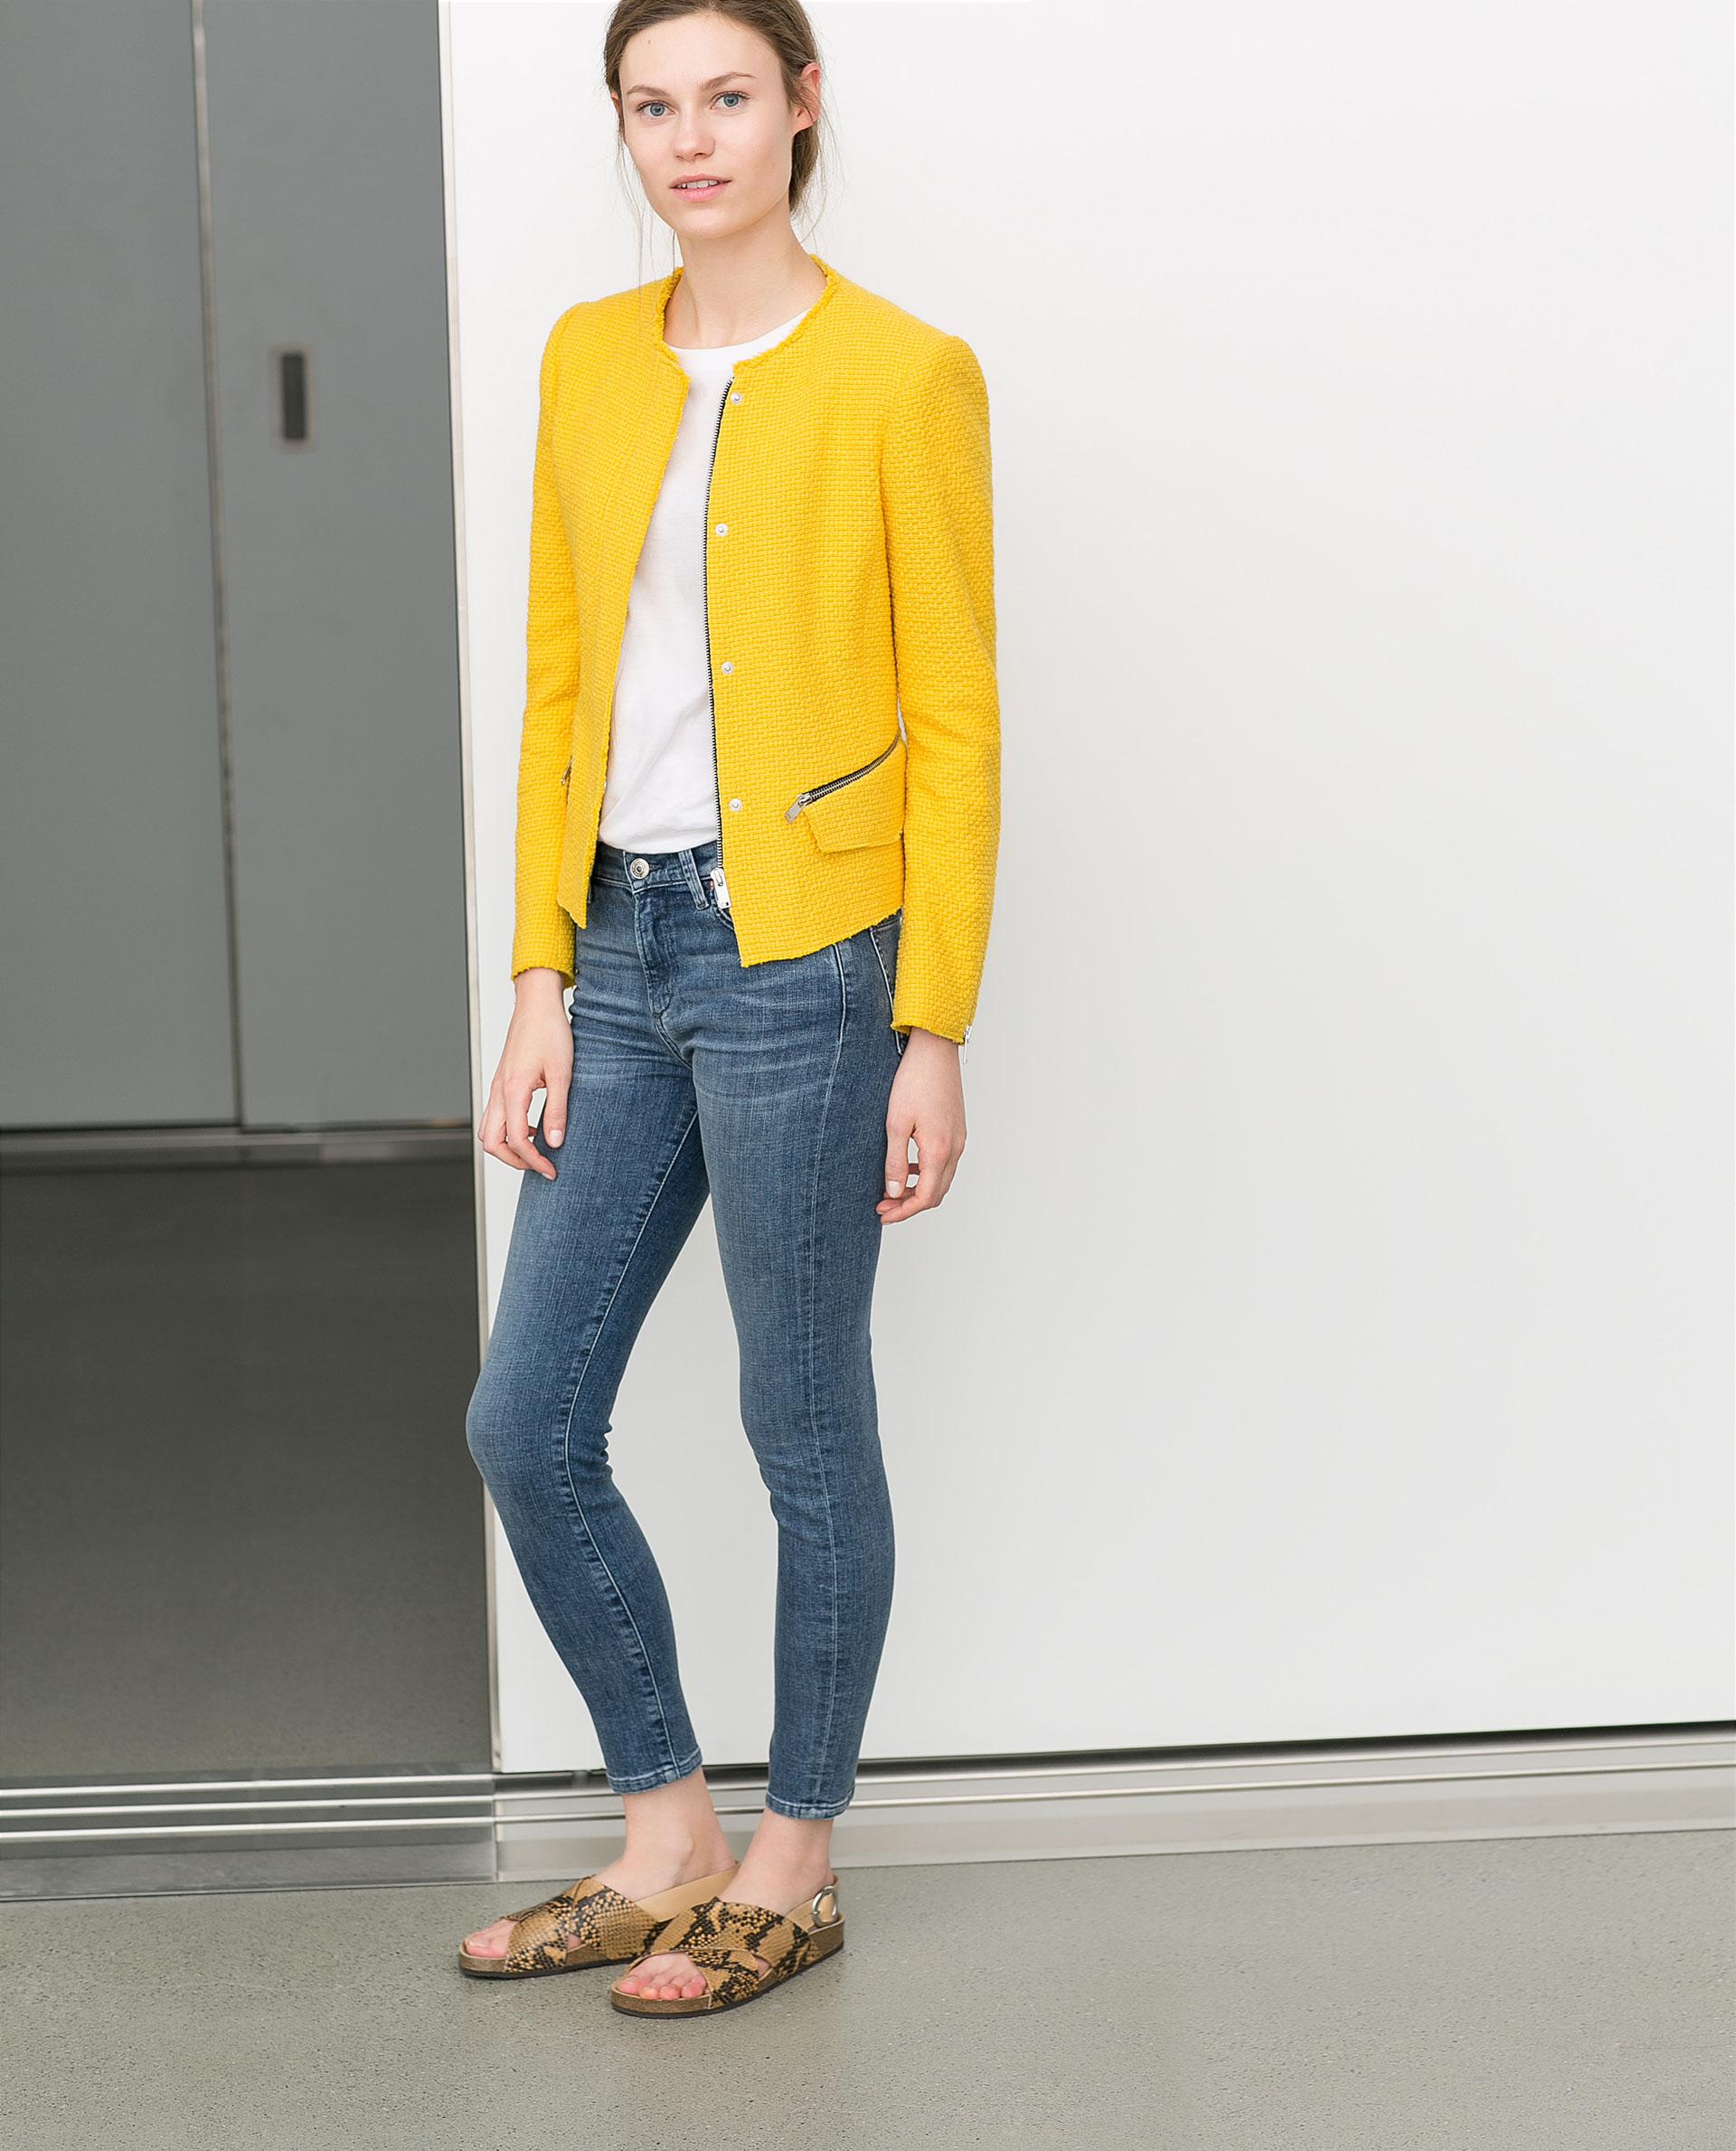 شلوار جین ریولت مدل لباس 2011 جدید,مدل لباس عروس,مدل لباس,مدل لباس شب, - مدل شلوار جین زنانه